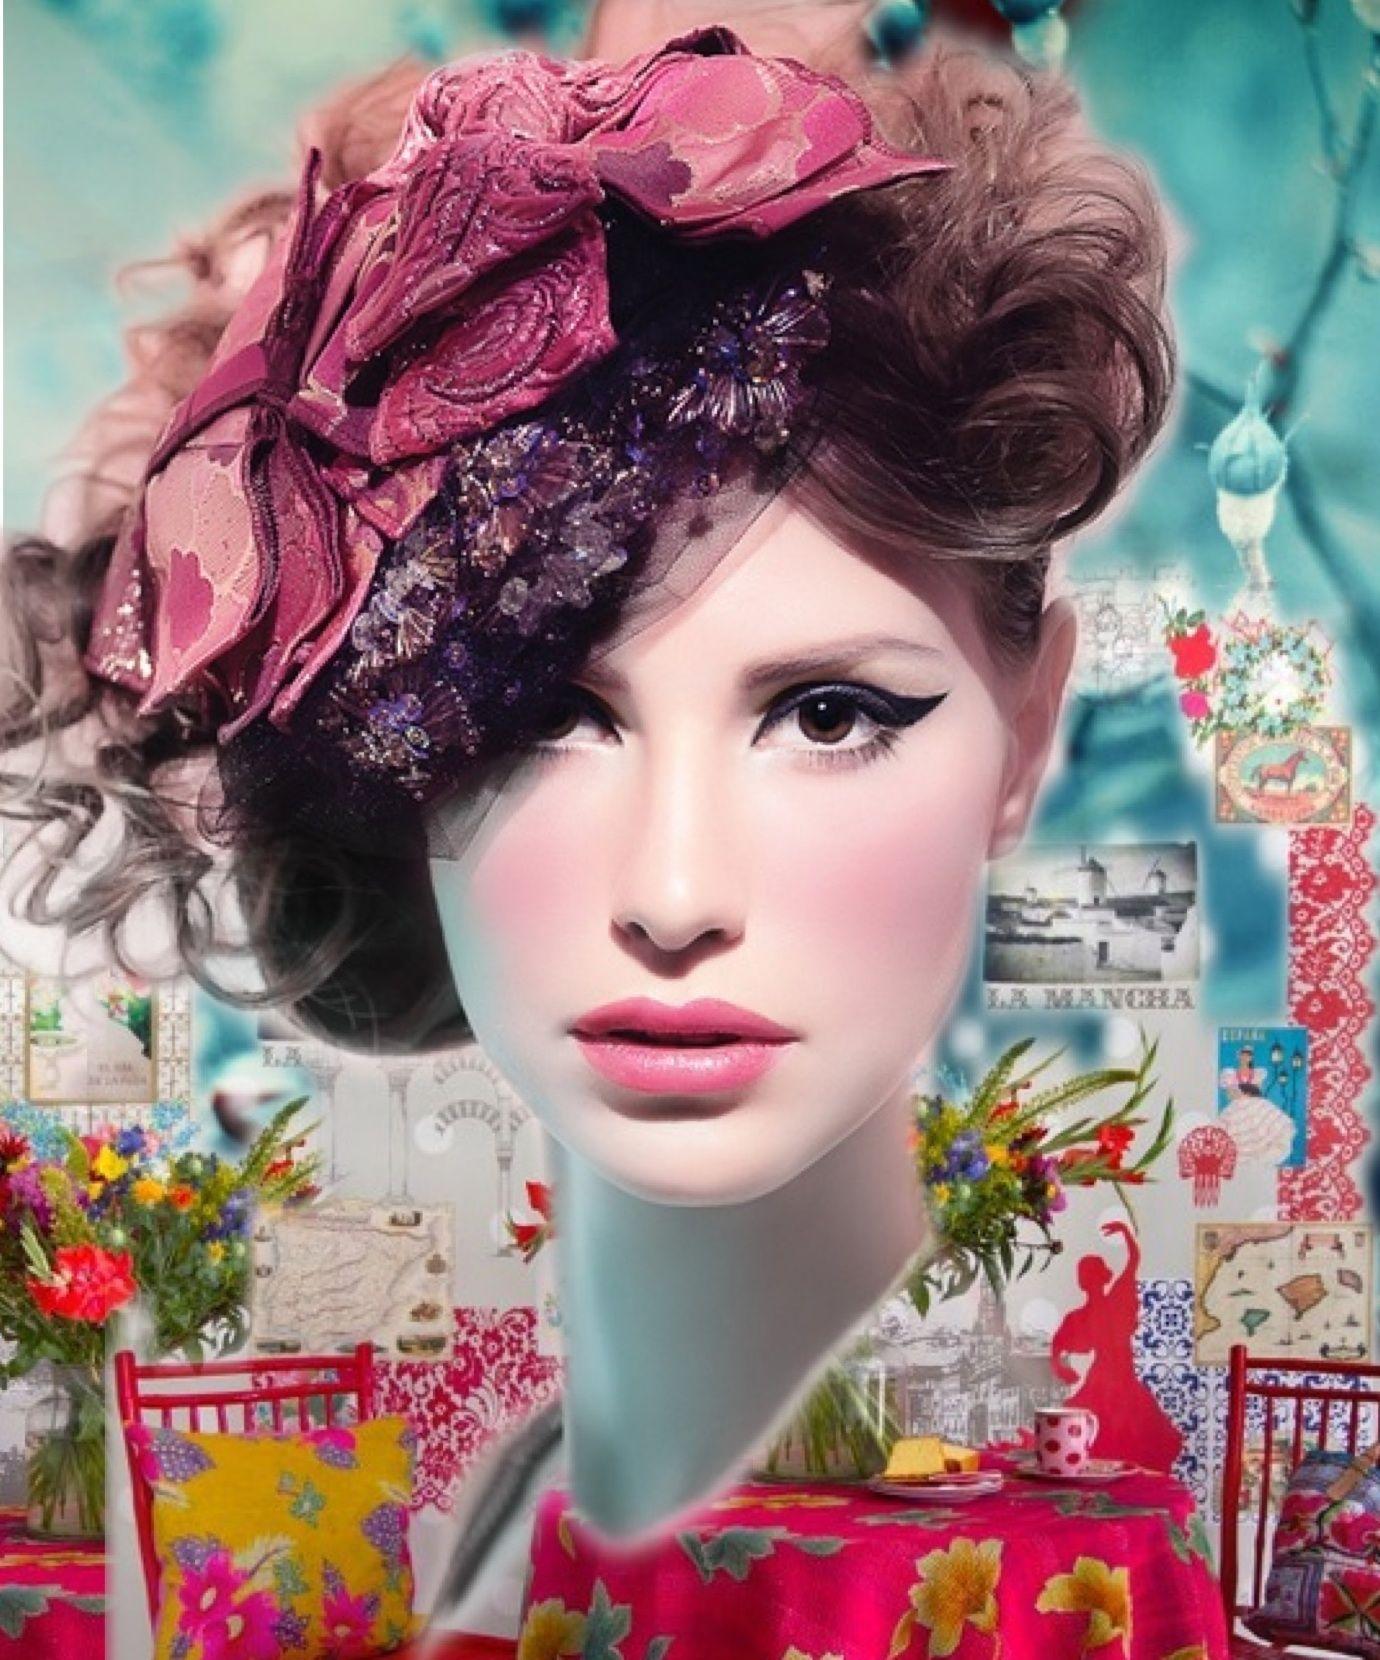 Beauty created with Bazaart by Akira Hashiguchi